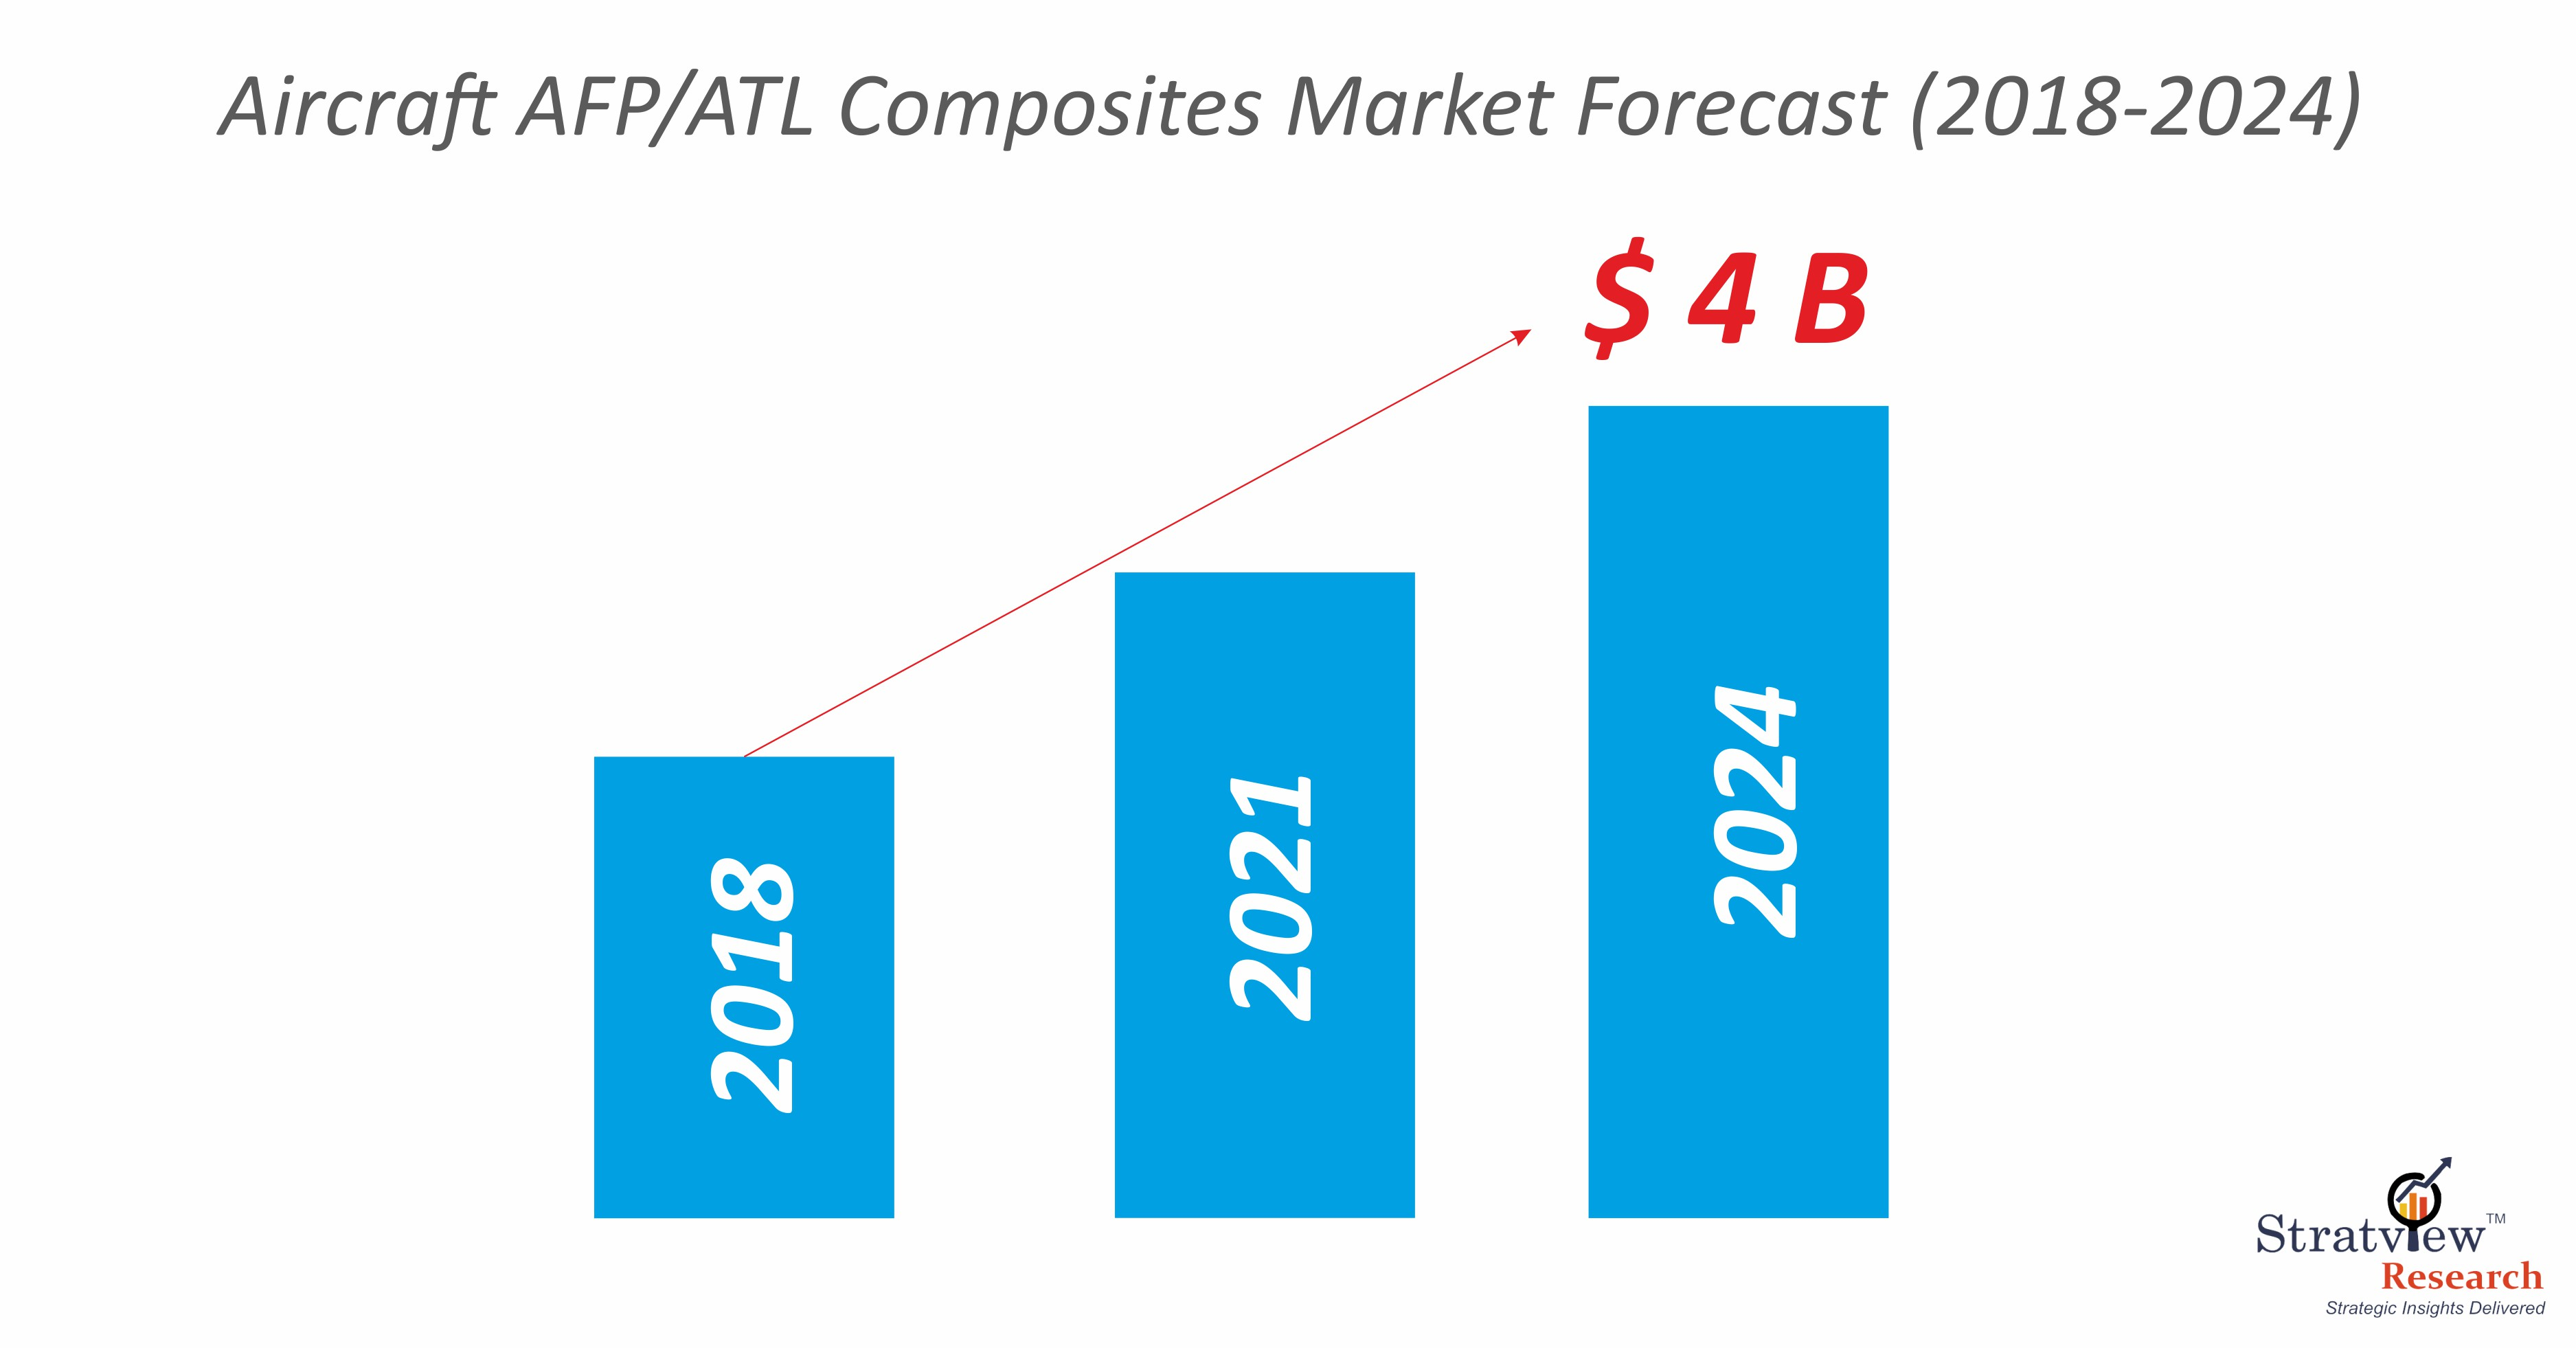 Aircraft AFP/ATL Composites Market Forecast